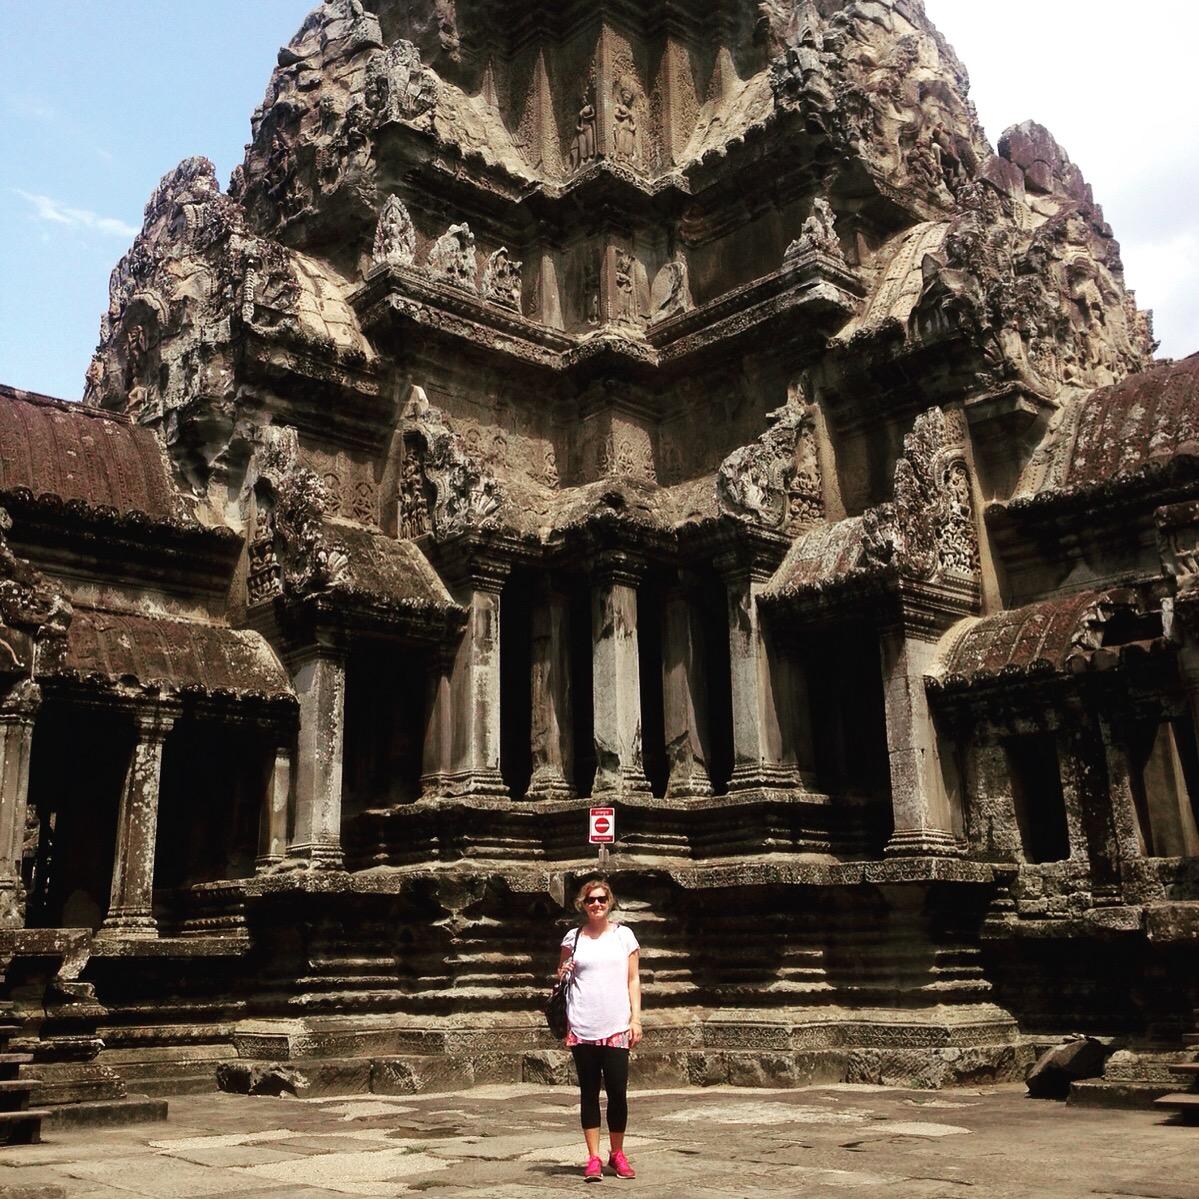 Katherine Conaway on Remote Year Battuta in Angkor